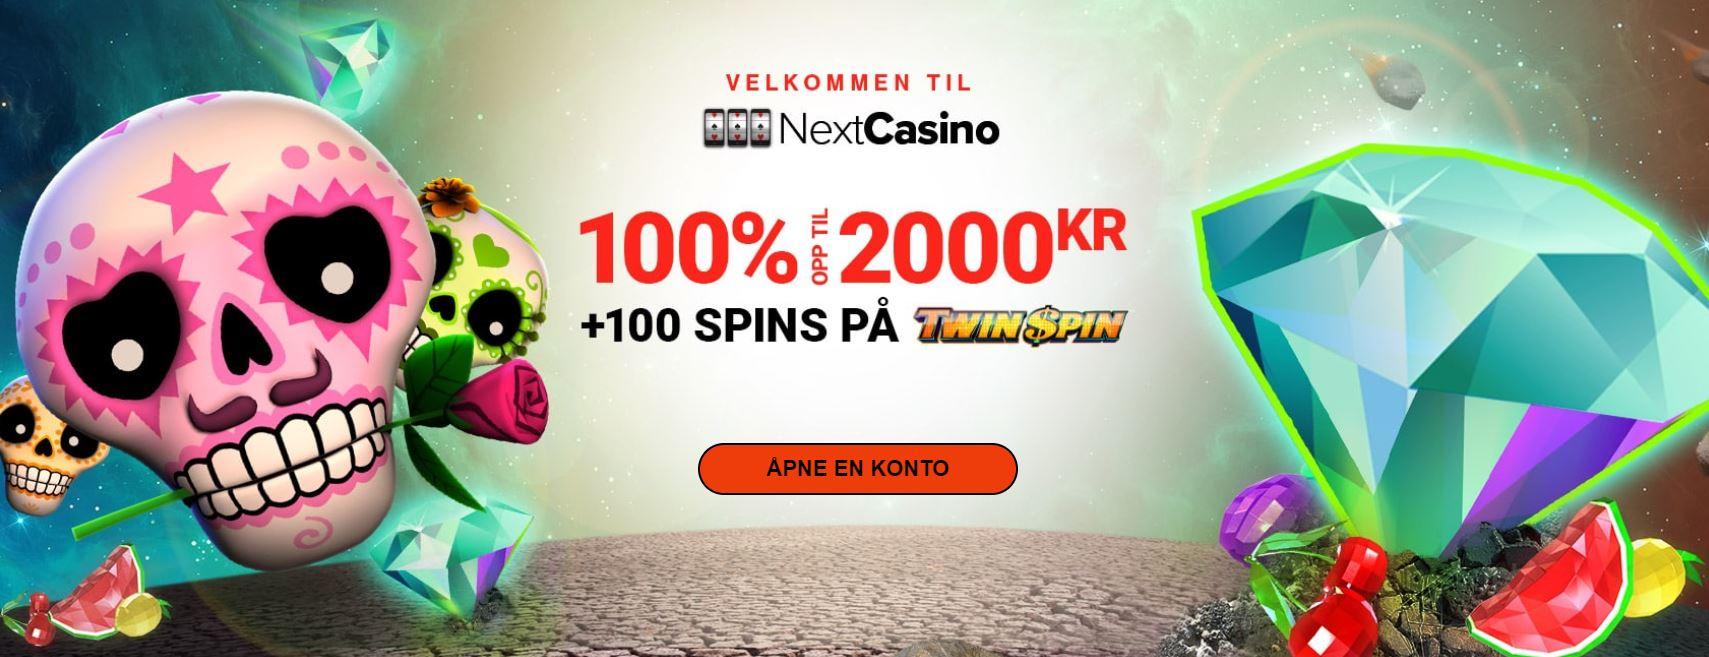 next casino velkomst